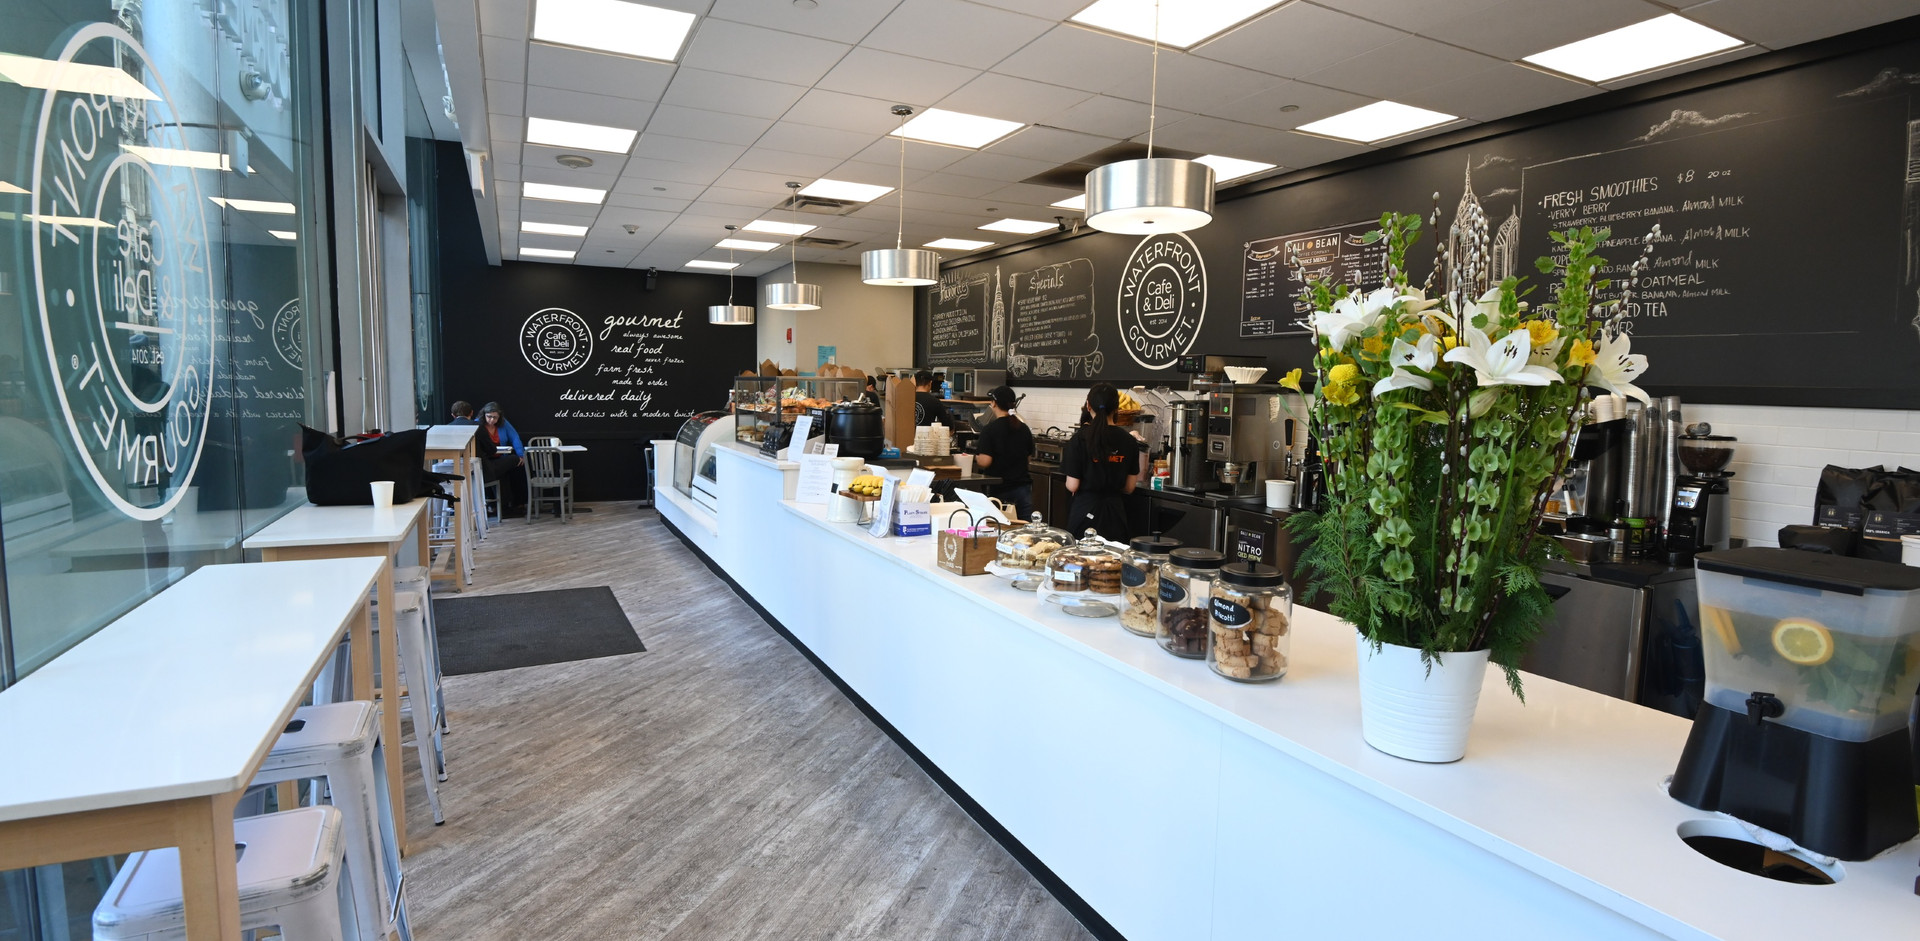 Waterfront_Gourmet_Café_at_the_Ritz_Car